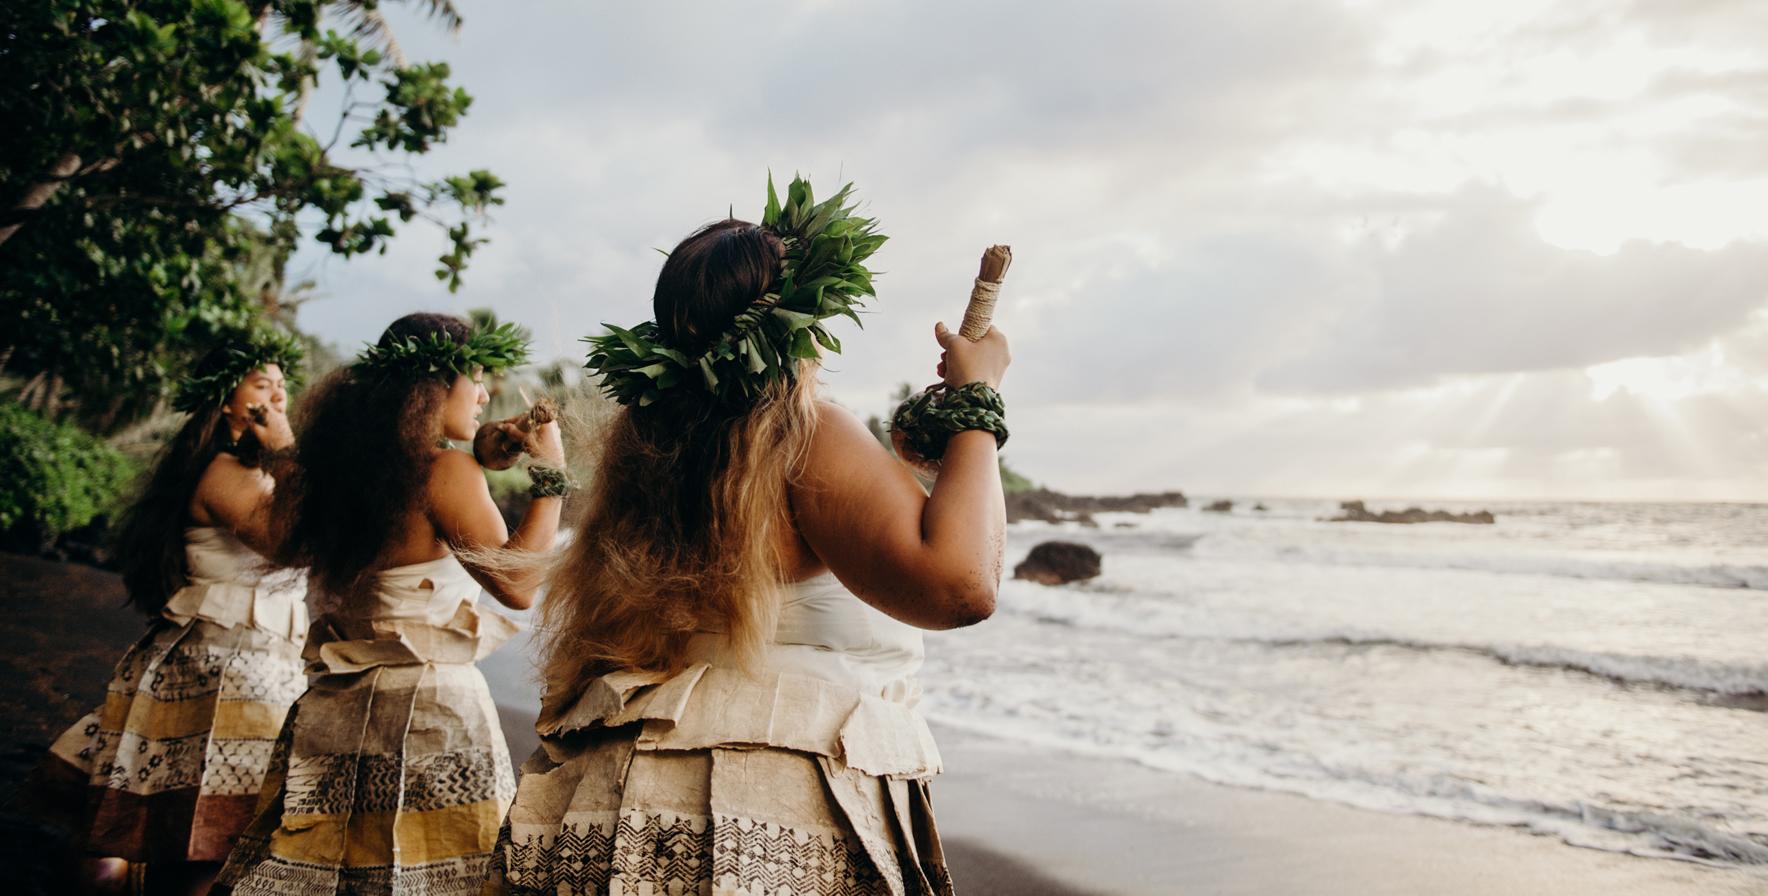 Hawaiian Culture & History